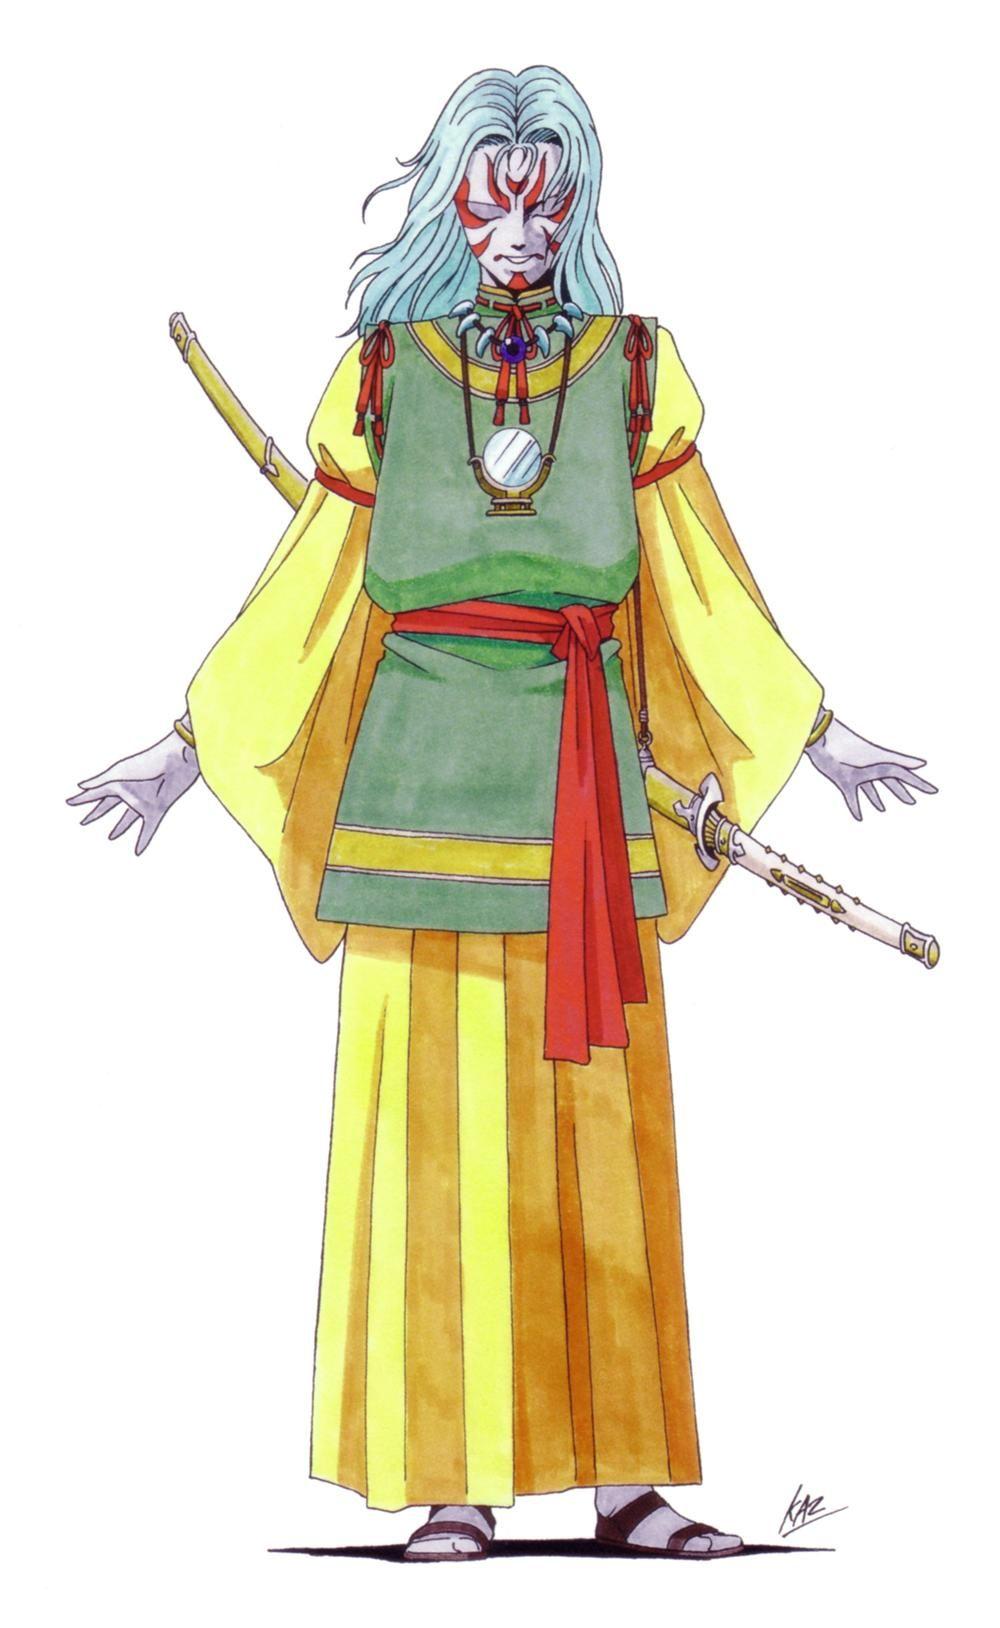 Shin Megami Tensei II Character Images in 2020 Shin